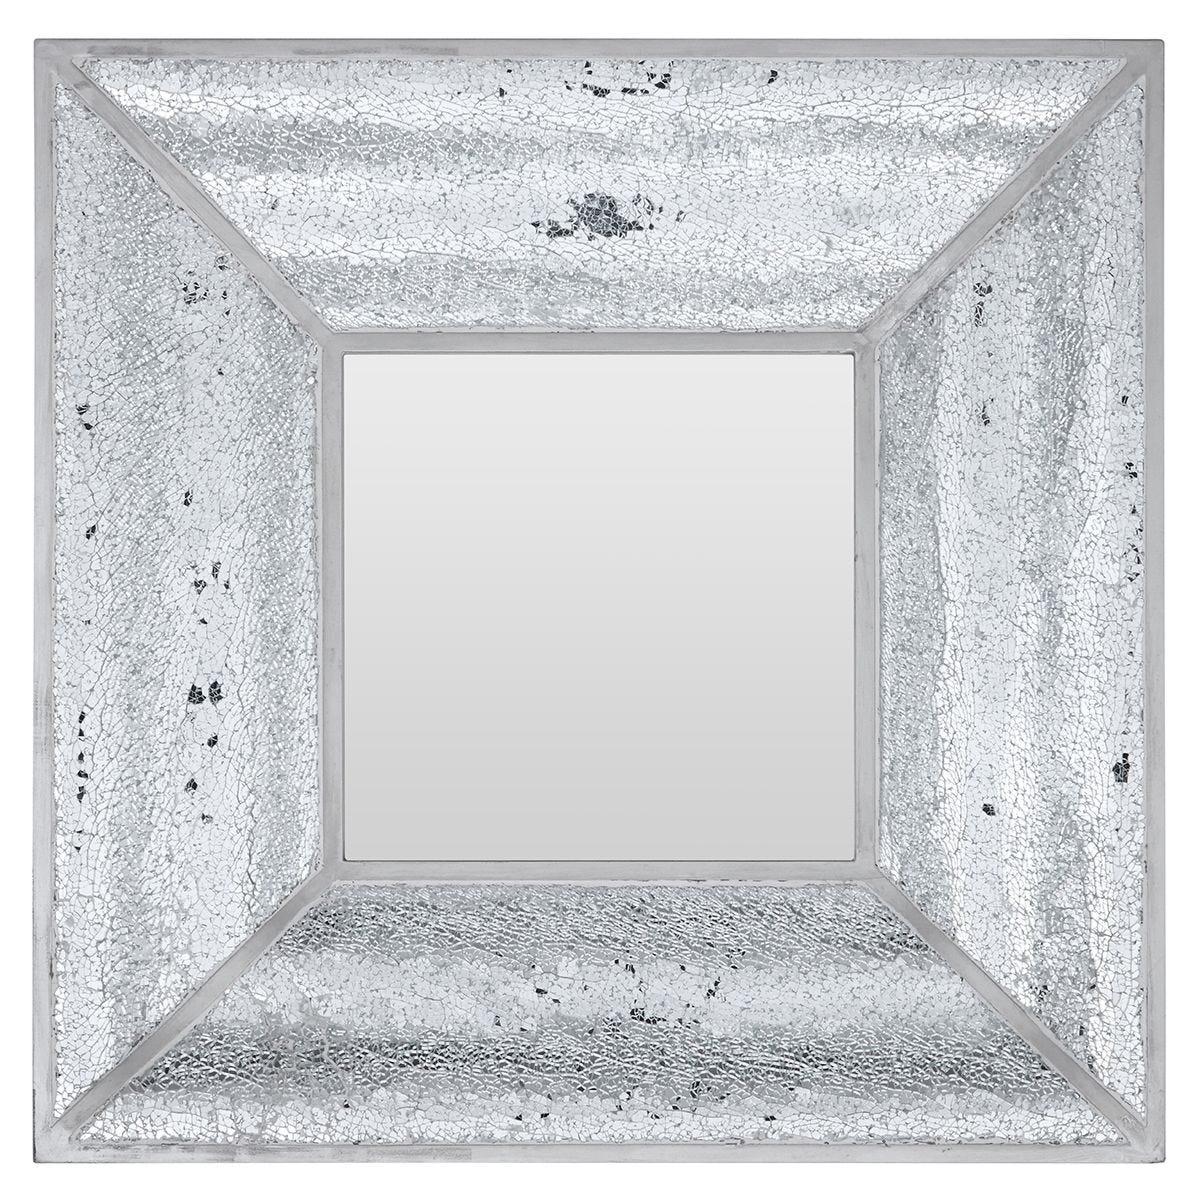 Premier Housewares Wonder Mosaic Wall Mirror - Silver